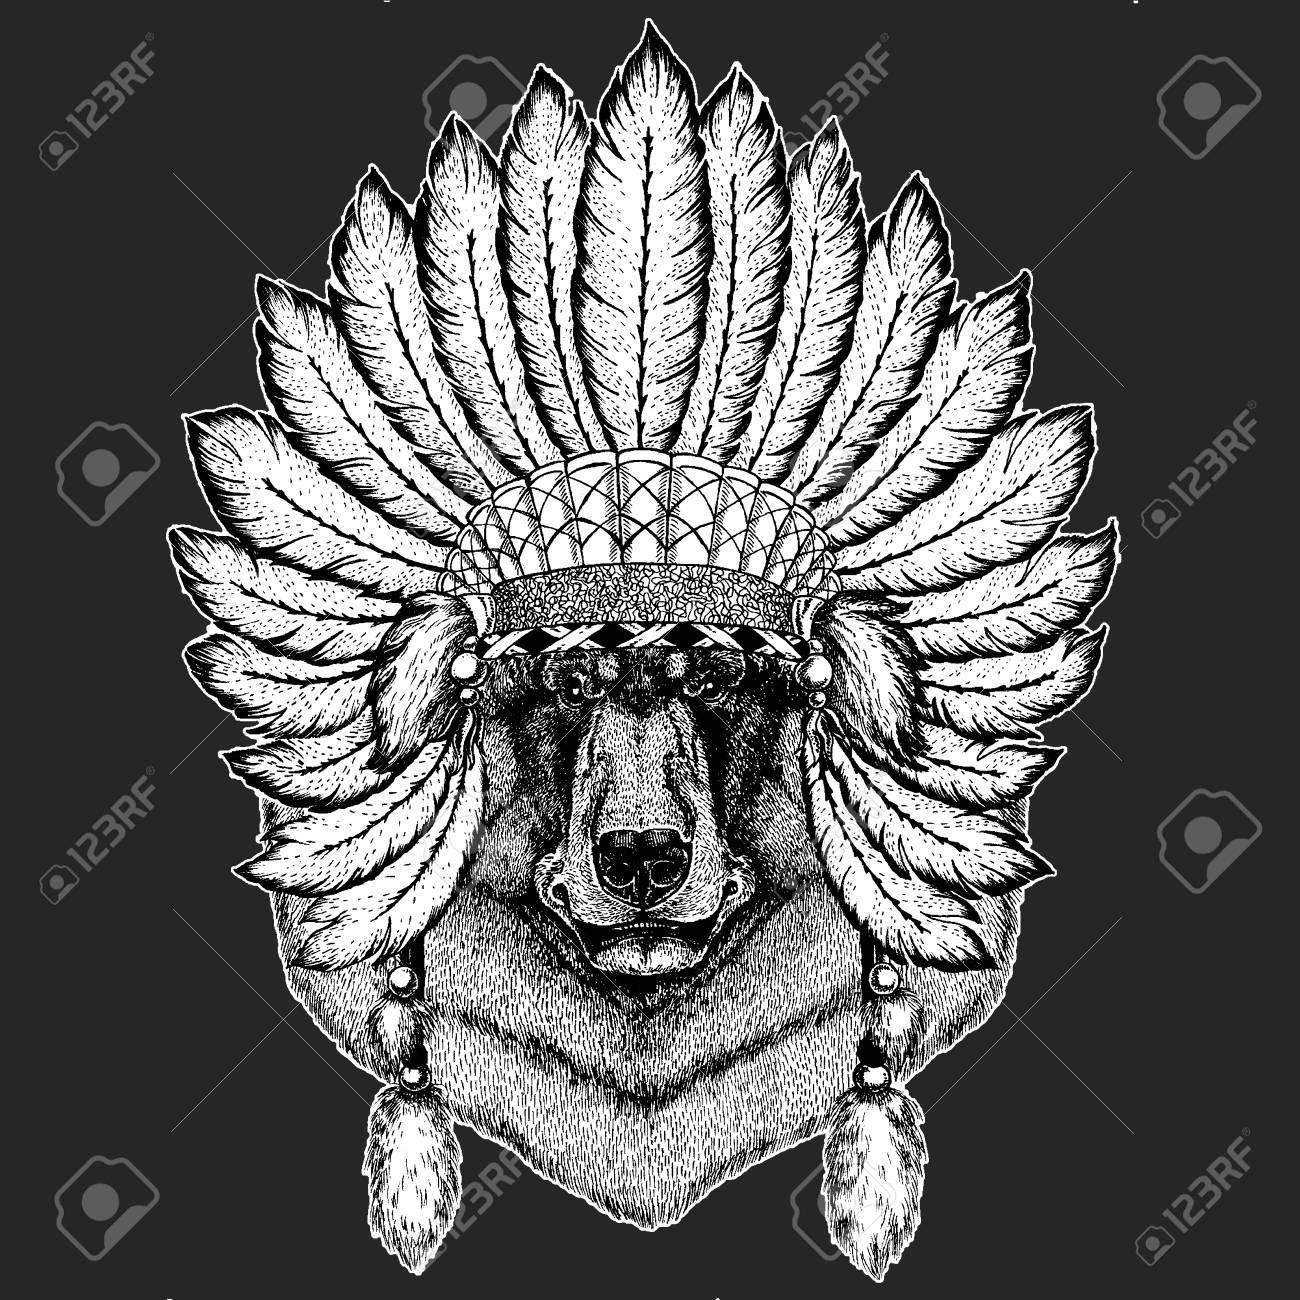 a09fe77f85b8c Black bear Traditional ethnic indian boho headdress Tribal shaman hat  Ceremonial element Stock Vector - 103666997